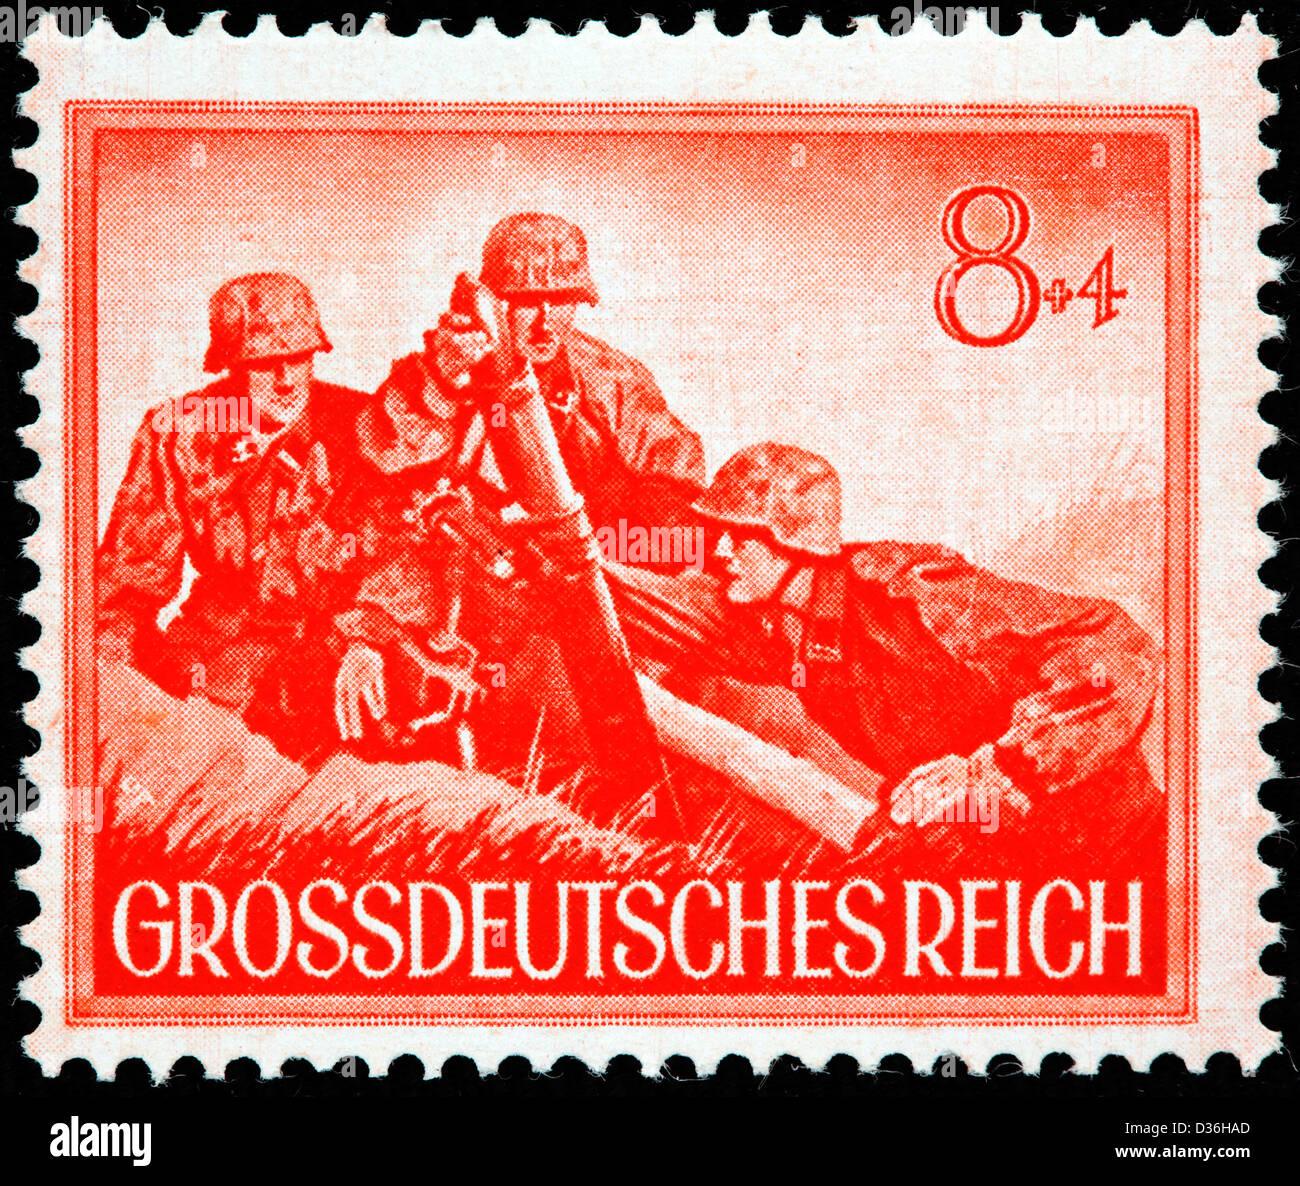 Schutz-Staffel grenade throwers, postage stamp, Germany, 1944 - Stock Image